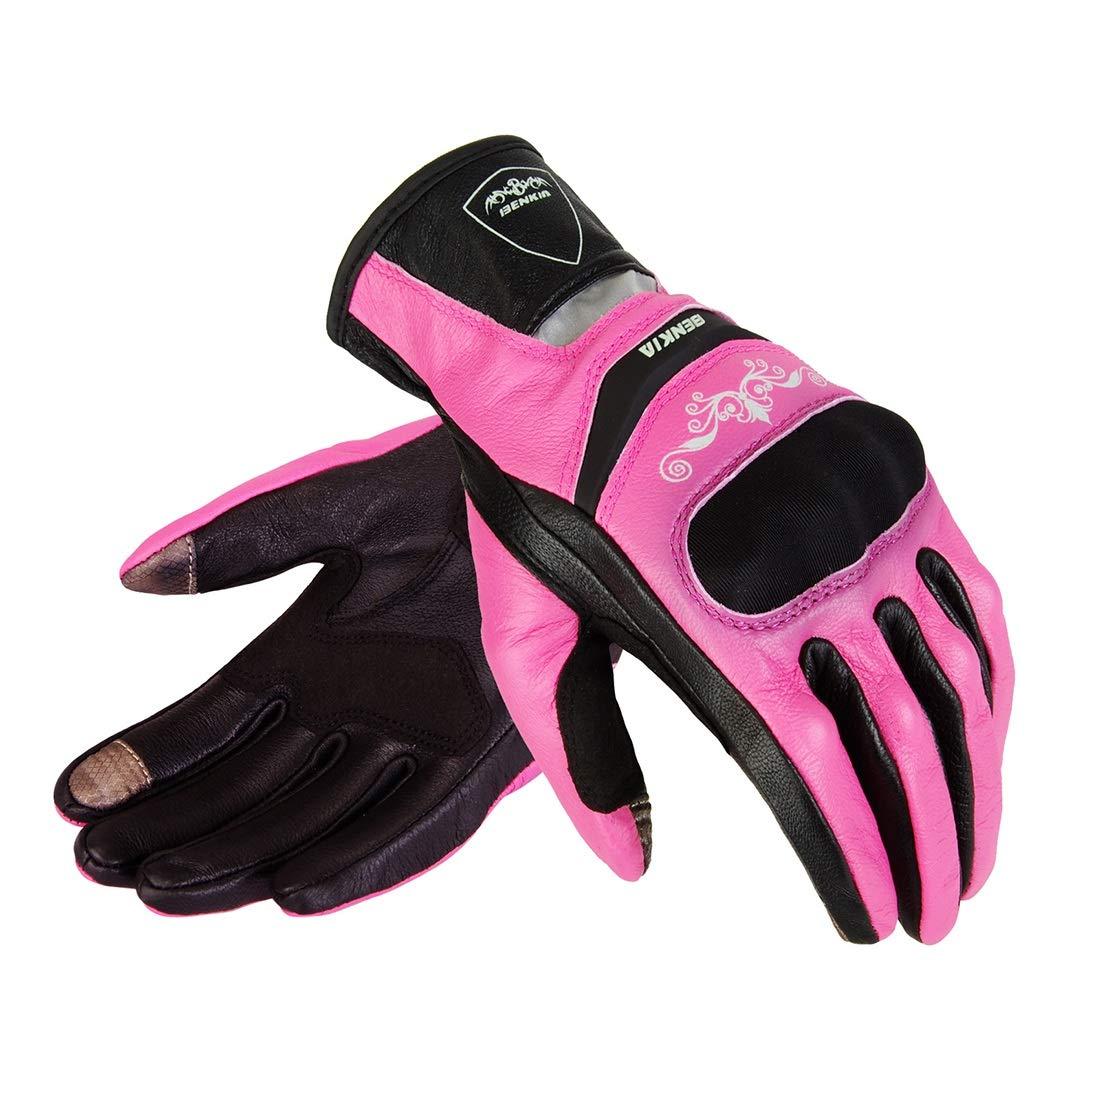 JESSIEKERVIN YY3 Frauen Motorrad Handschuhe Vollfinger Radfahren Handschuhe Für Motorrad Klettern Wandern Jagd Outdoor Sports Gear Handschuhe